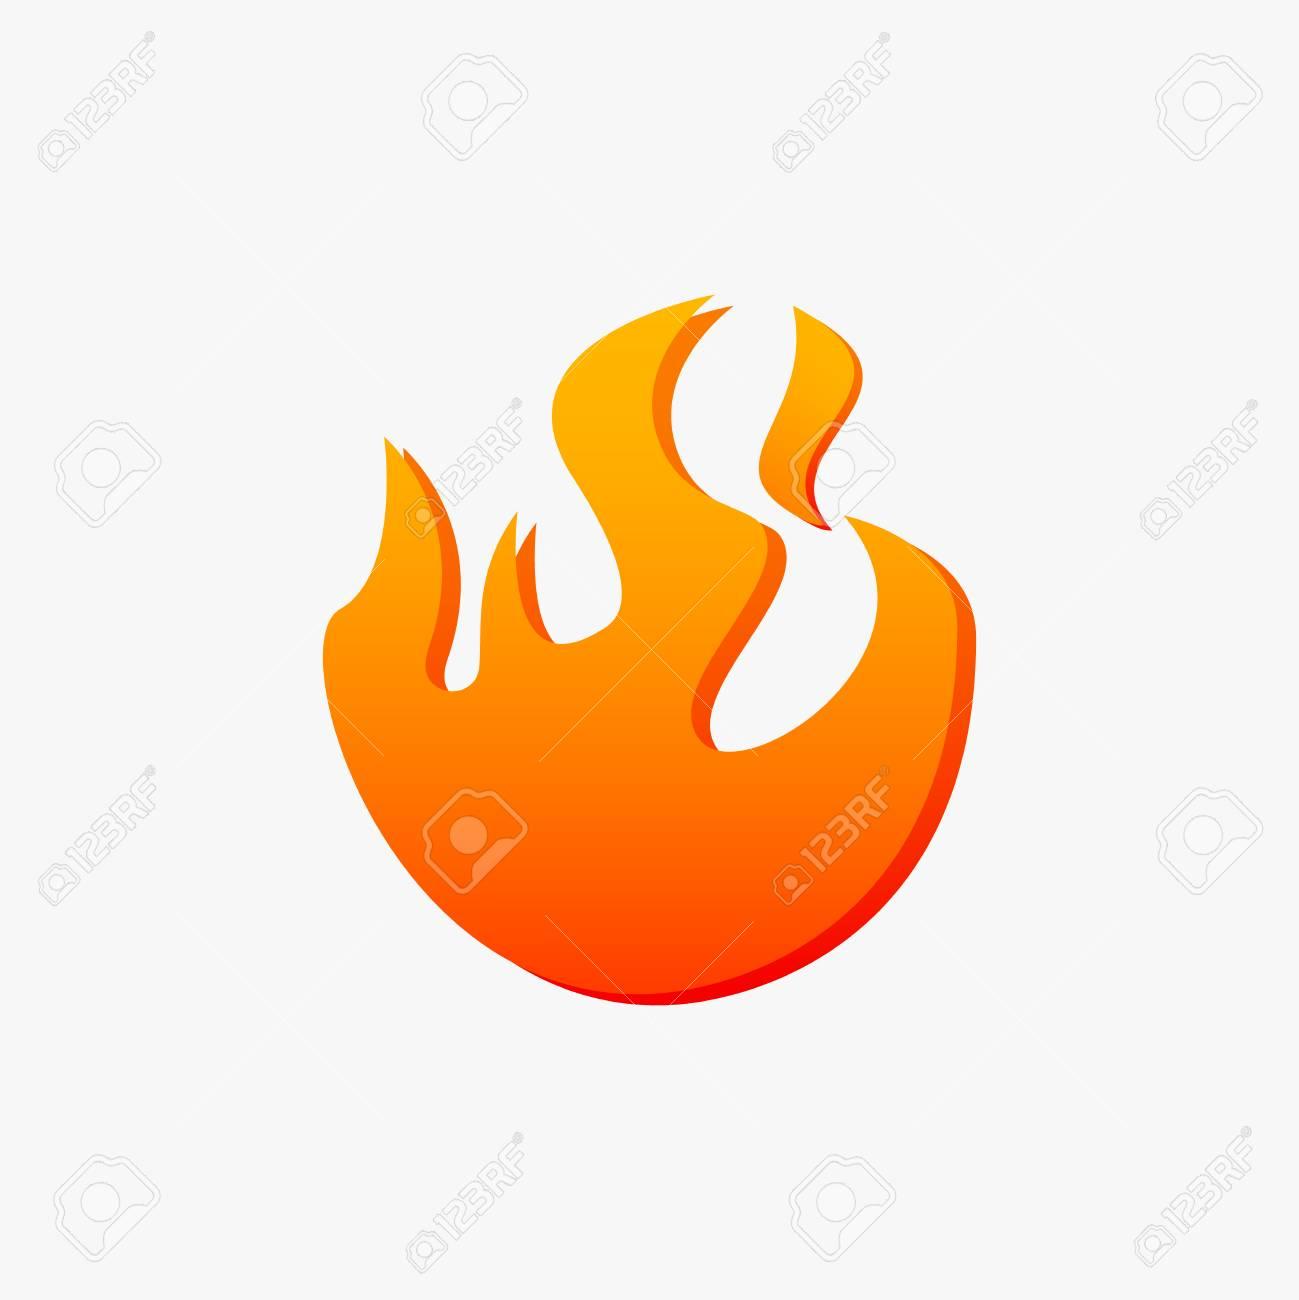 hight resolution of ignite vector fireball icon stock vector 114438121